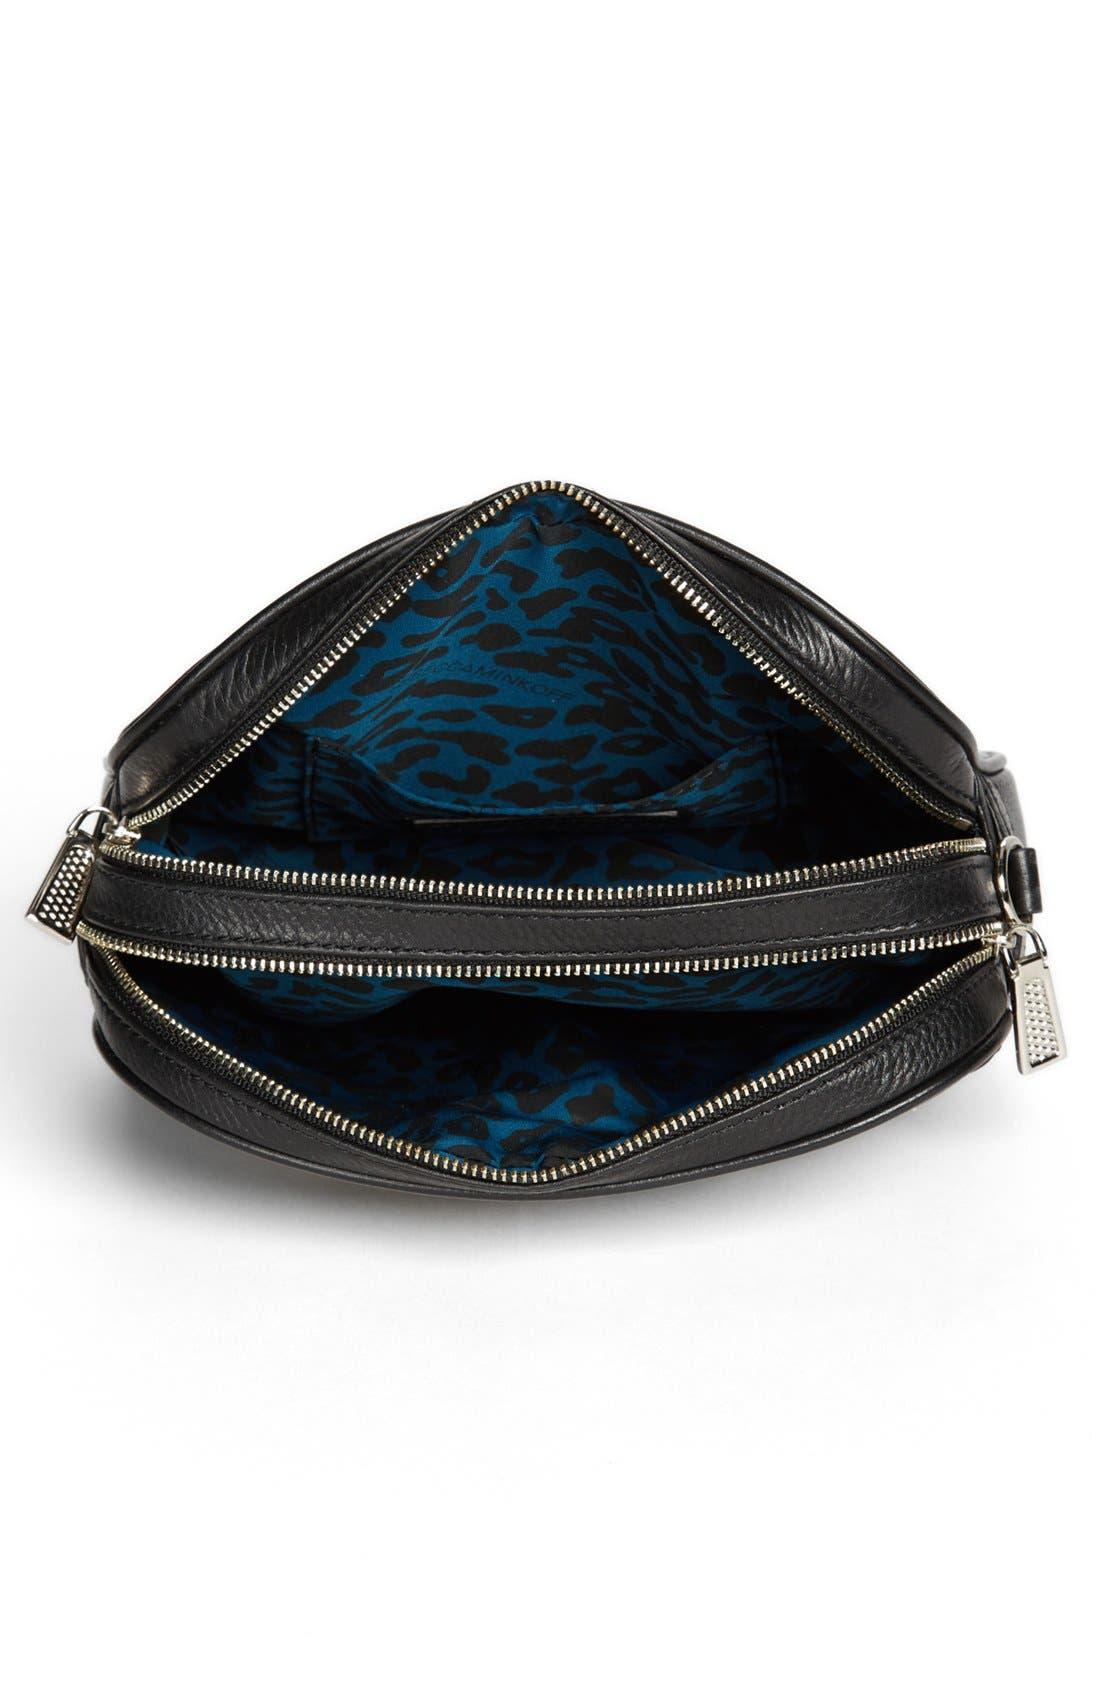 Alternate Image 3  - Rebecca Minkoff 'Rumor' Leather Crossbody Bag, Small